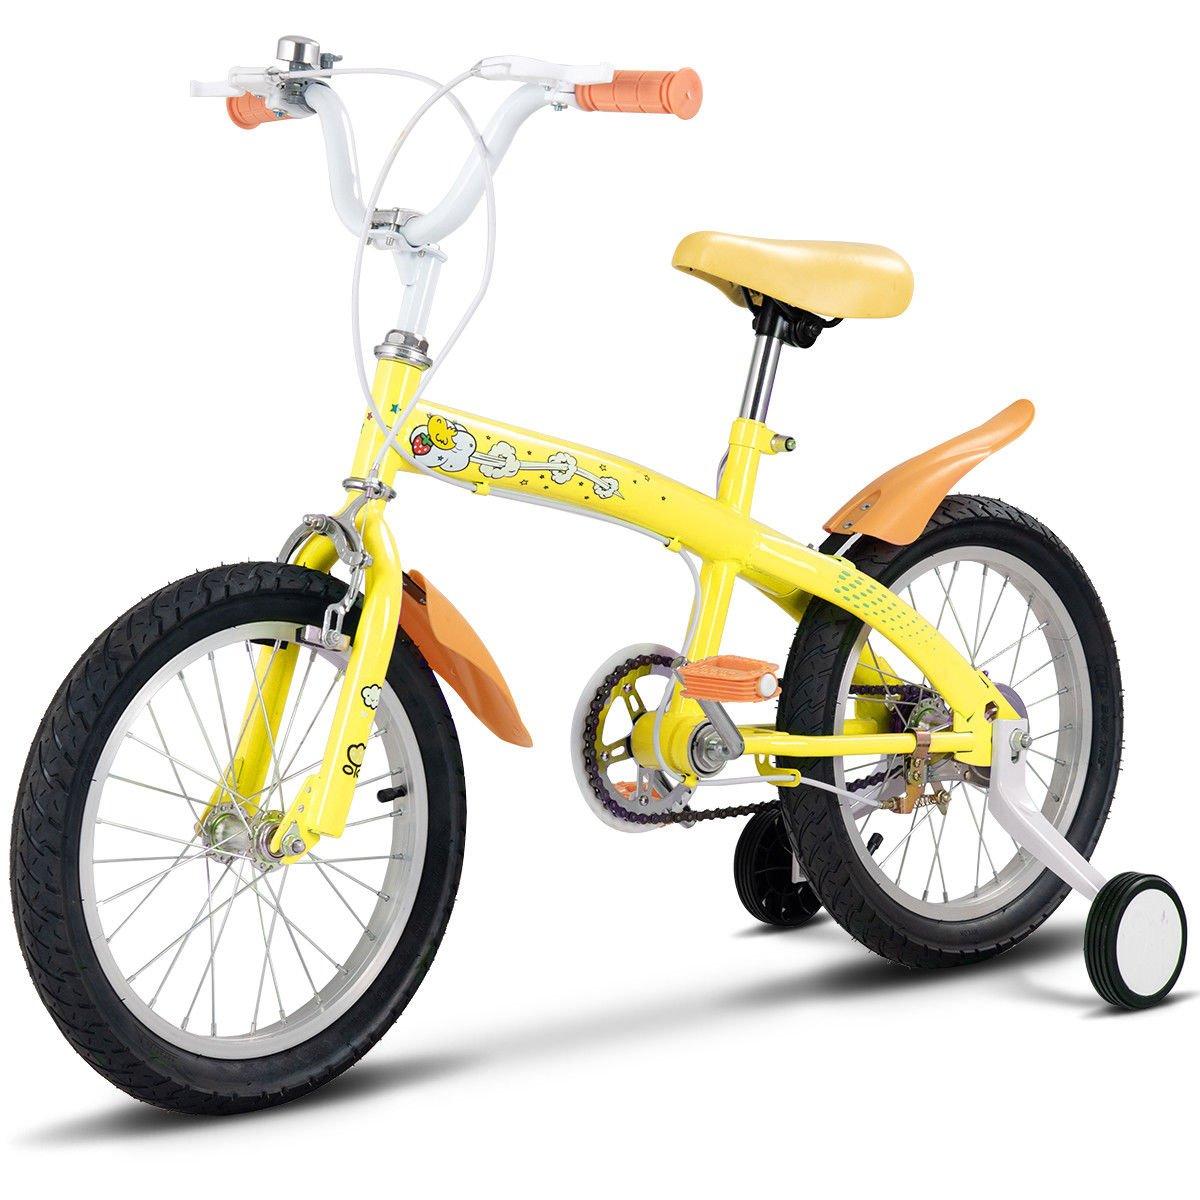 FDInspiration Yellow 45'' x 31.5'' Metal Frame Kids Bike w/Training Wheels with Ebook by FDInspiration (Image #3)